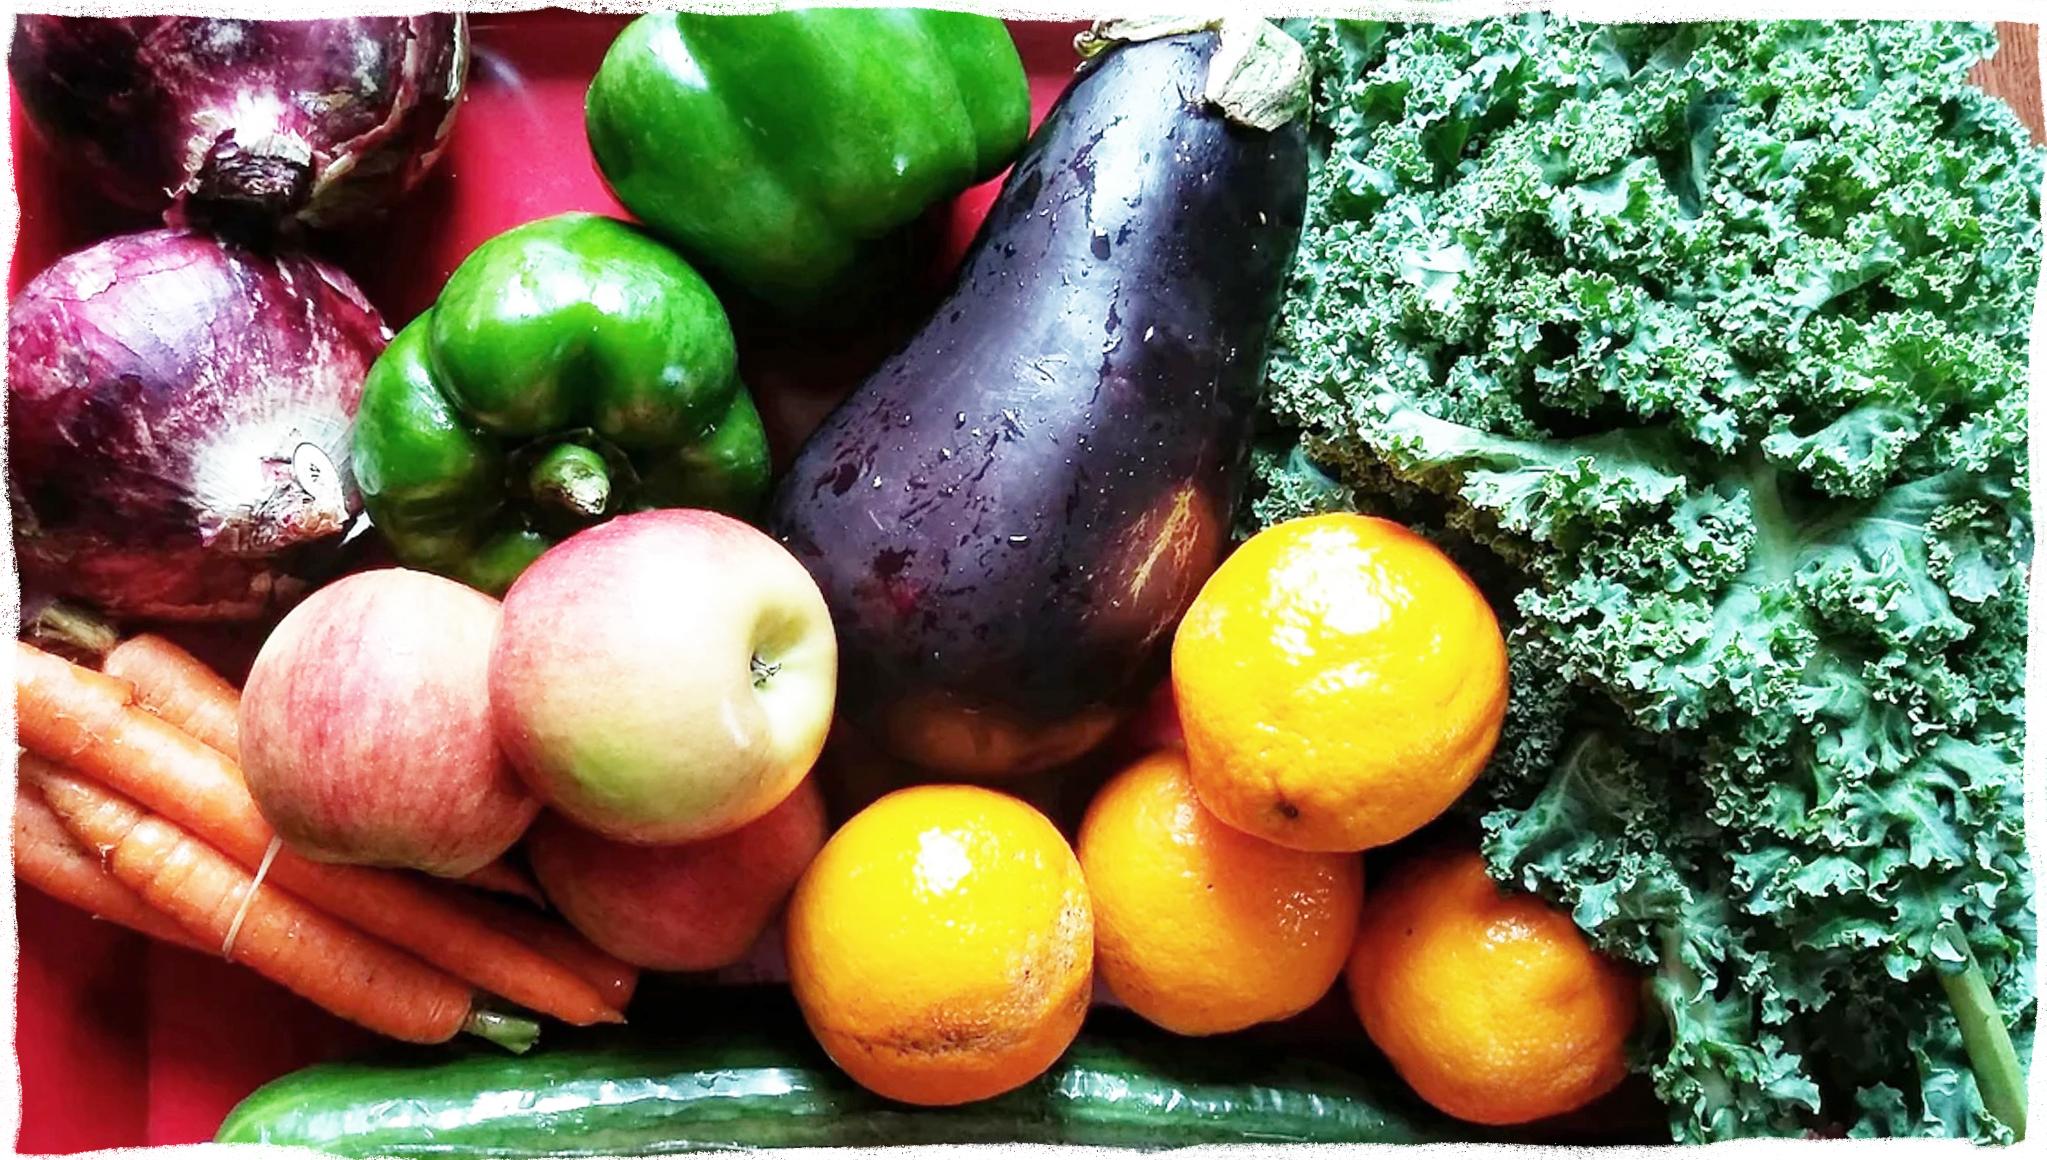 Learning patience & appreciation with fruits & veggies - Danni McGhee, DAM Good Vegan